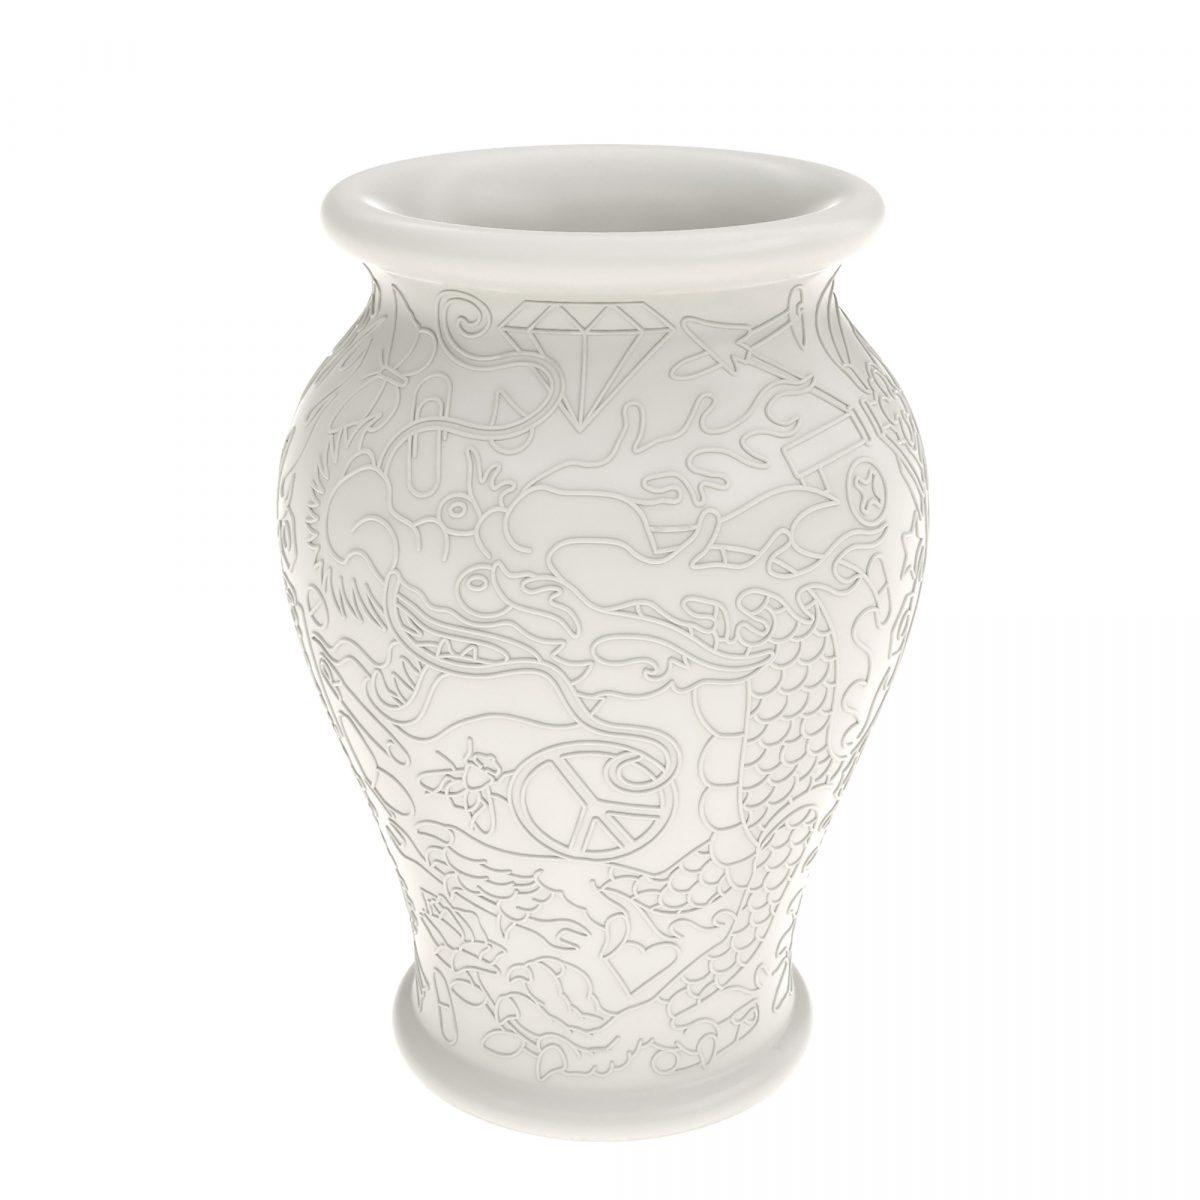 Qeeboo Ming Vase Dutch Design Vaas Wit